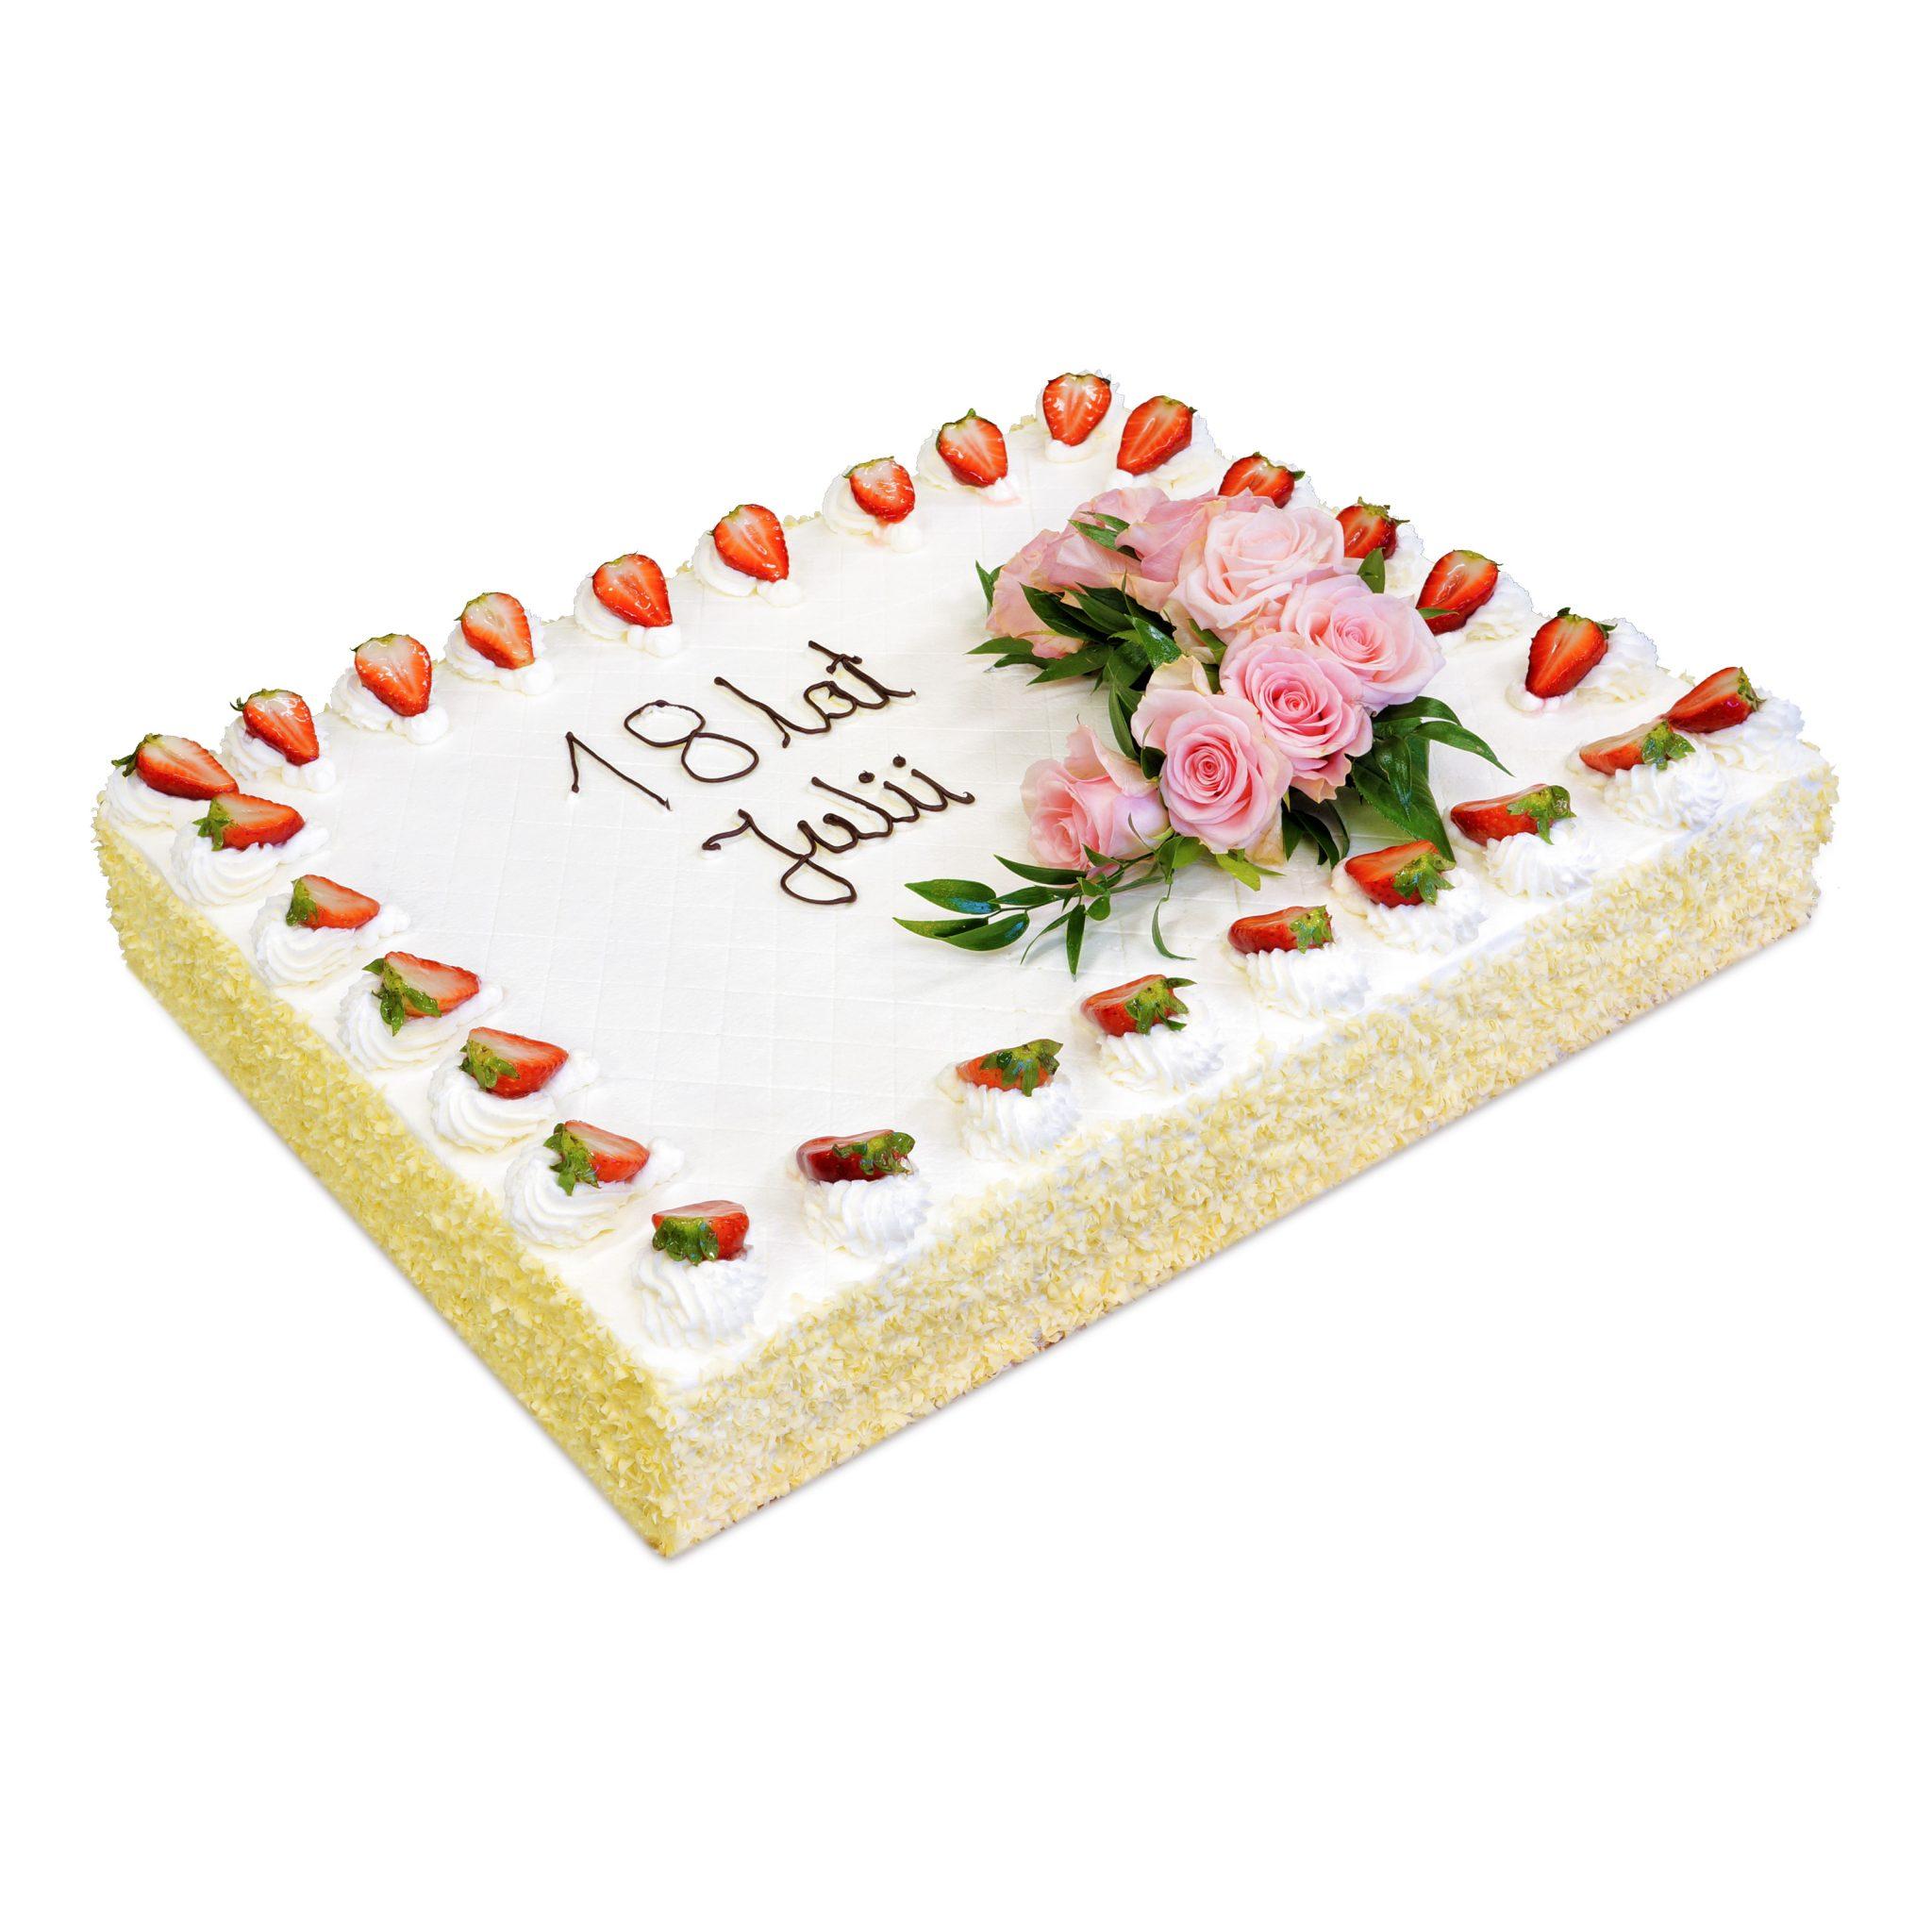 Tort na osiemnastkę